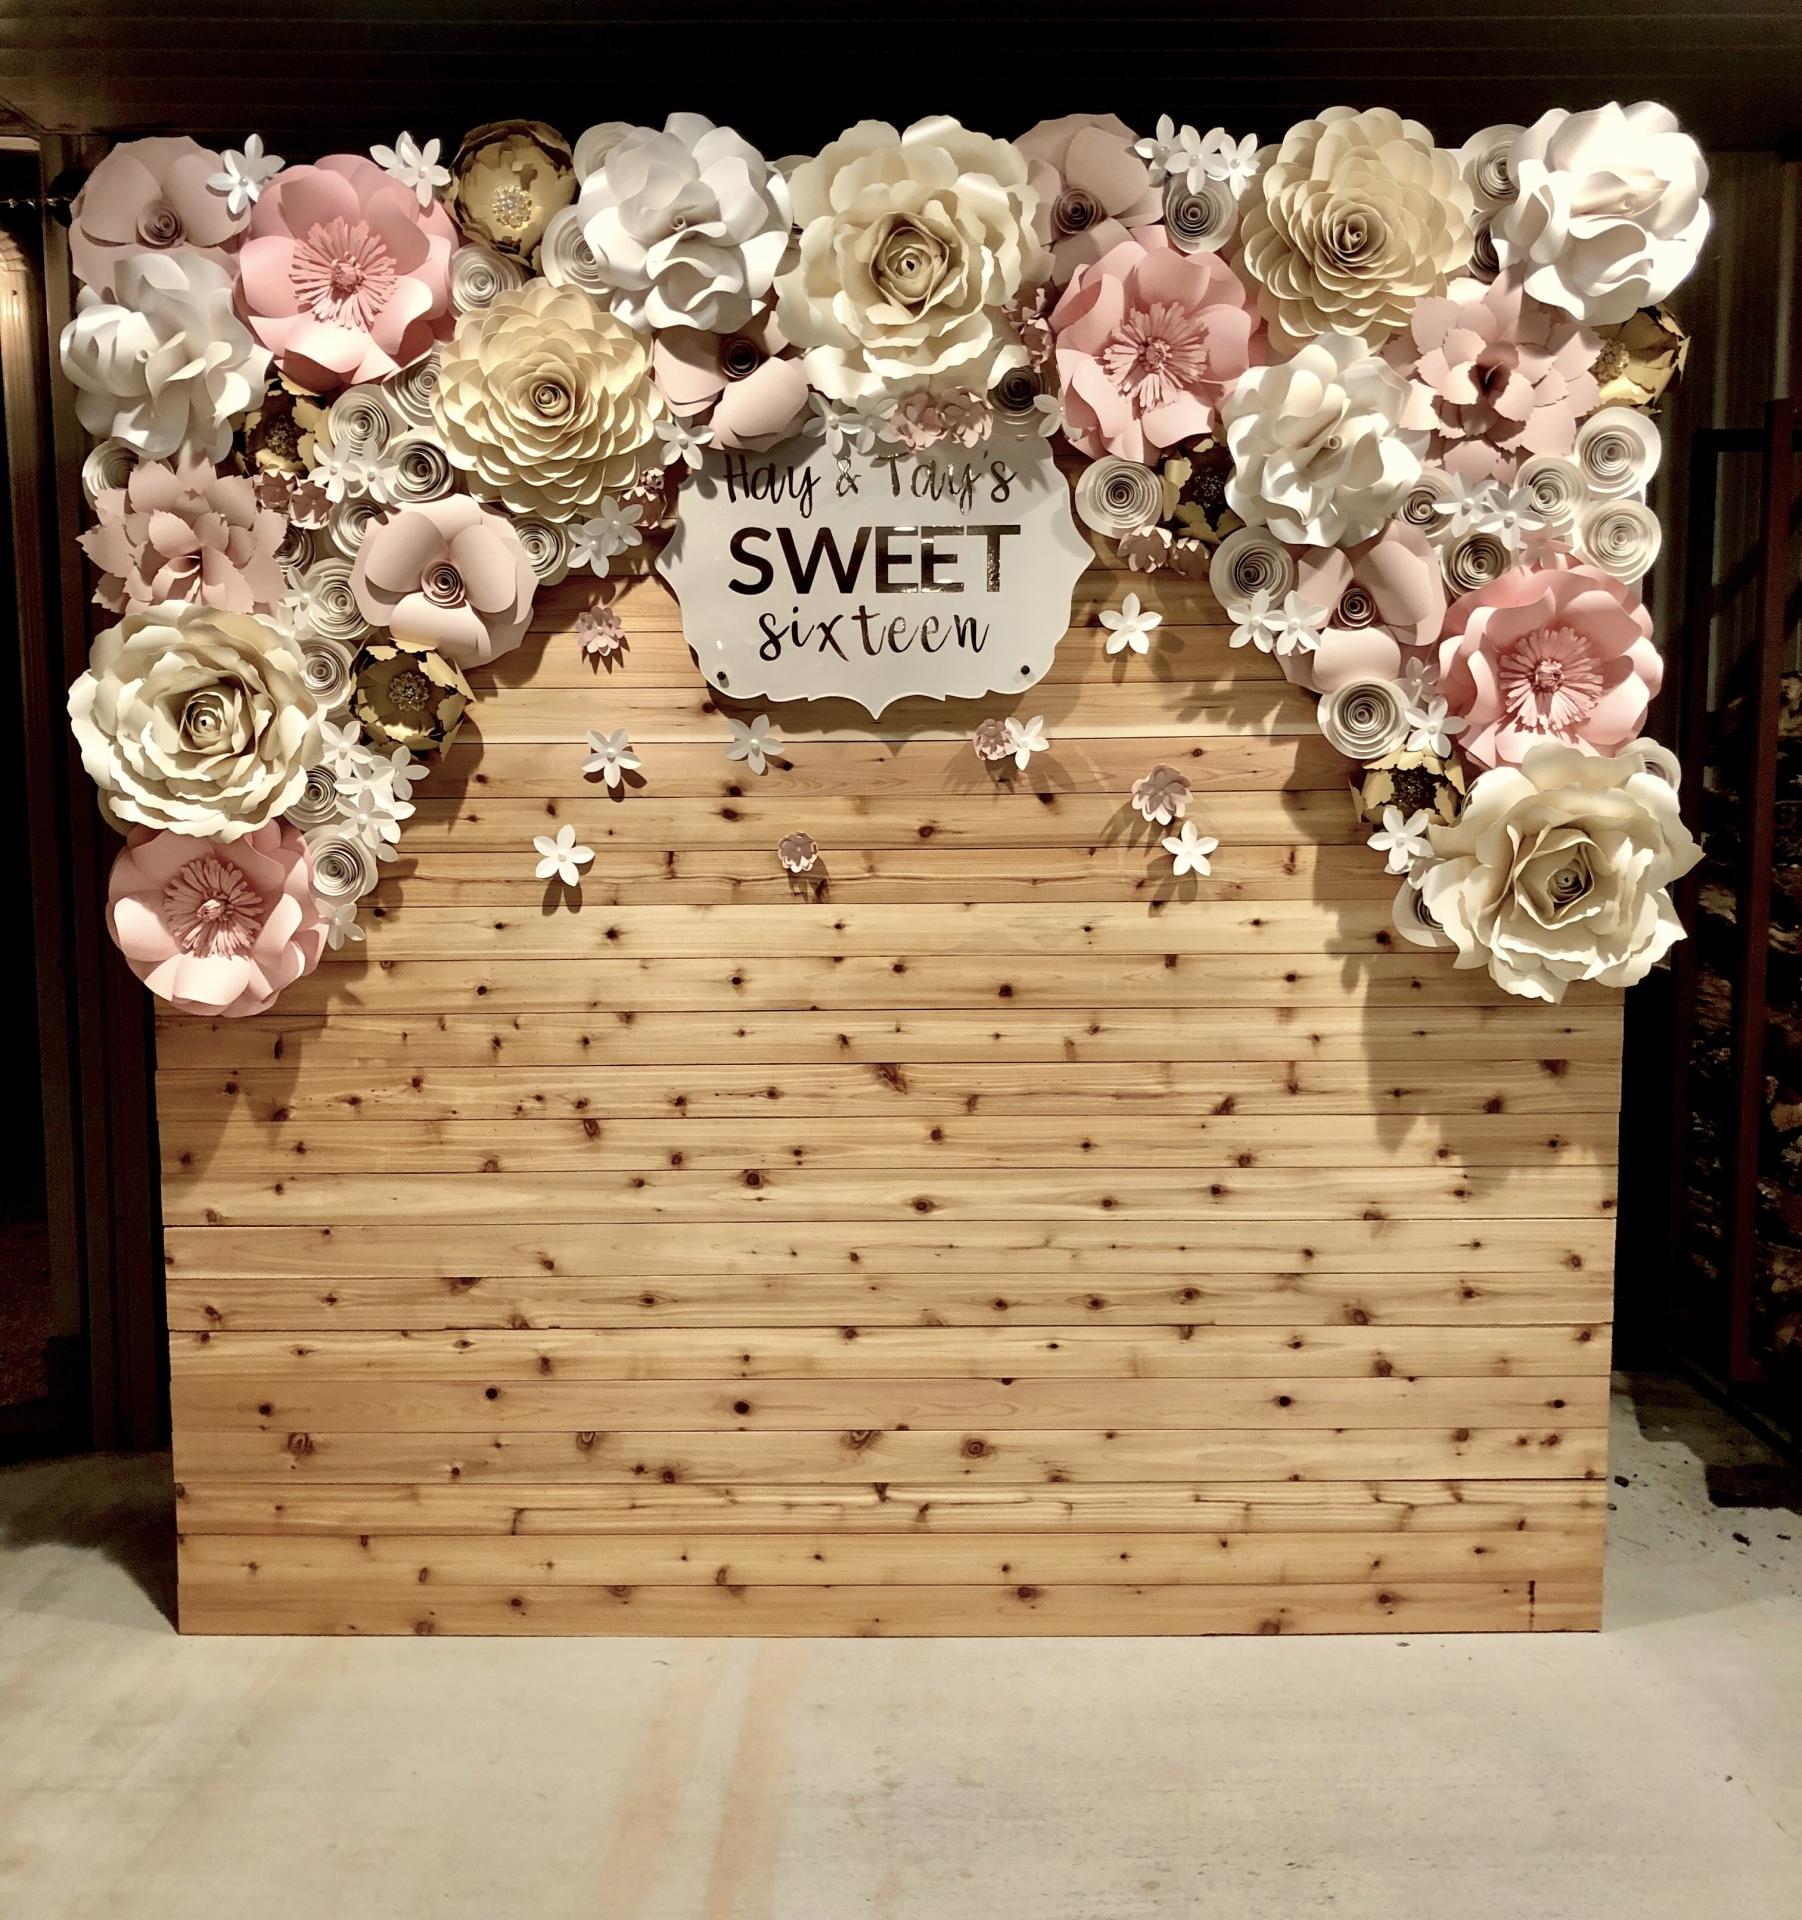 Sweet sixteen decor, rustic sweet sixteen, rustic party decor